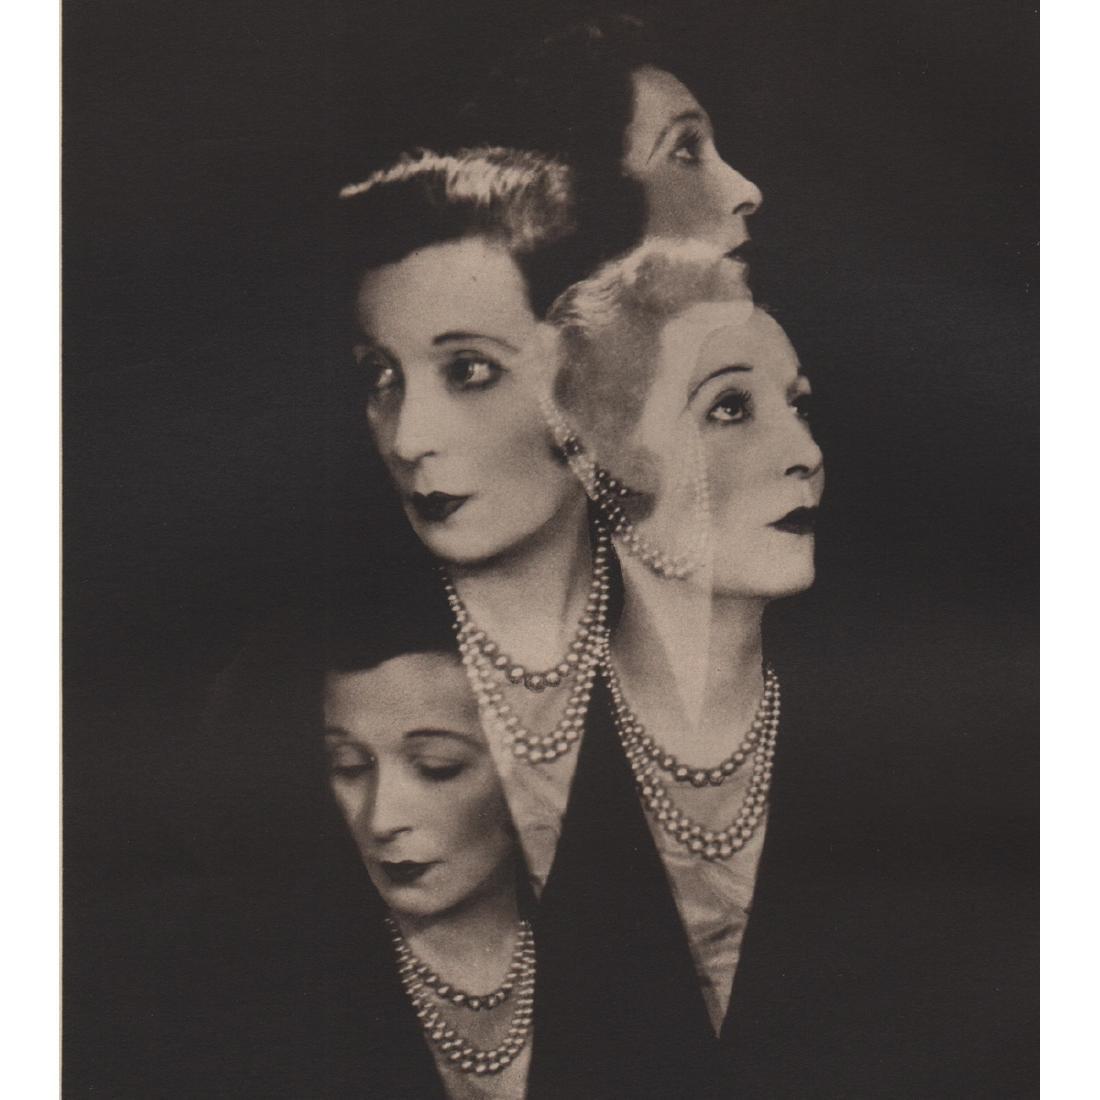 CECIL BEATON - Lady Lavery